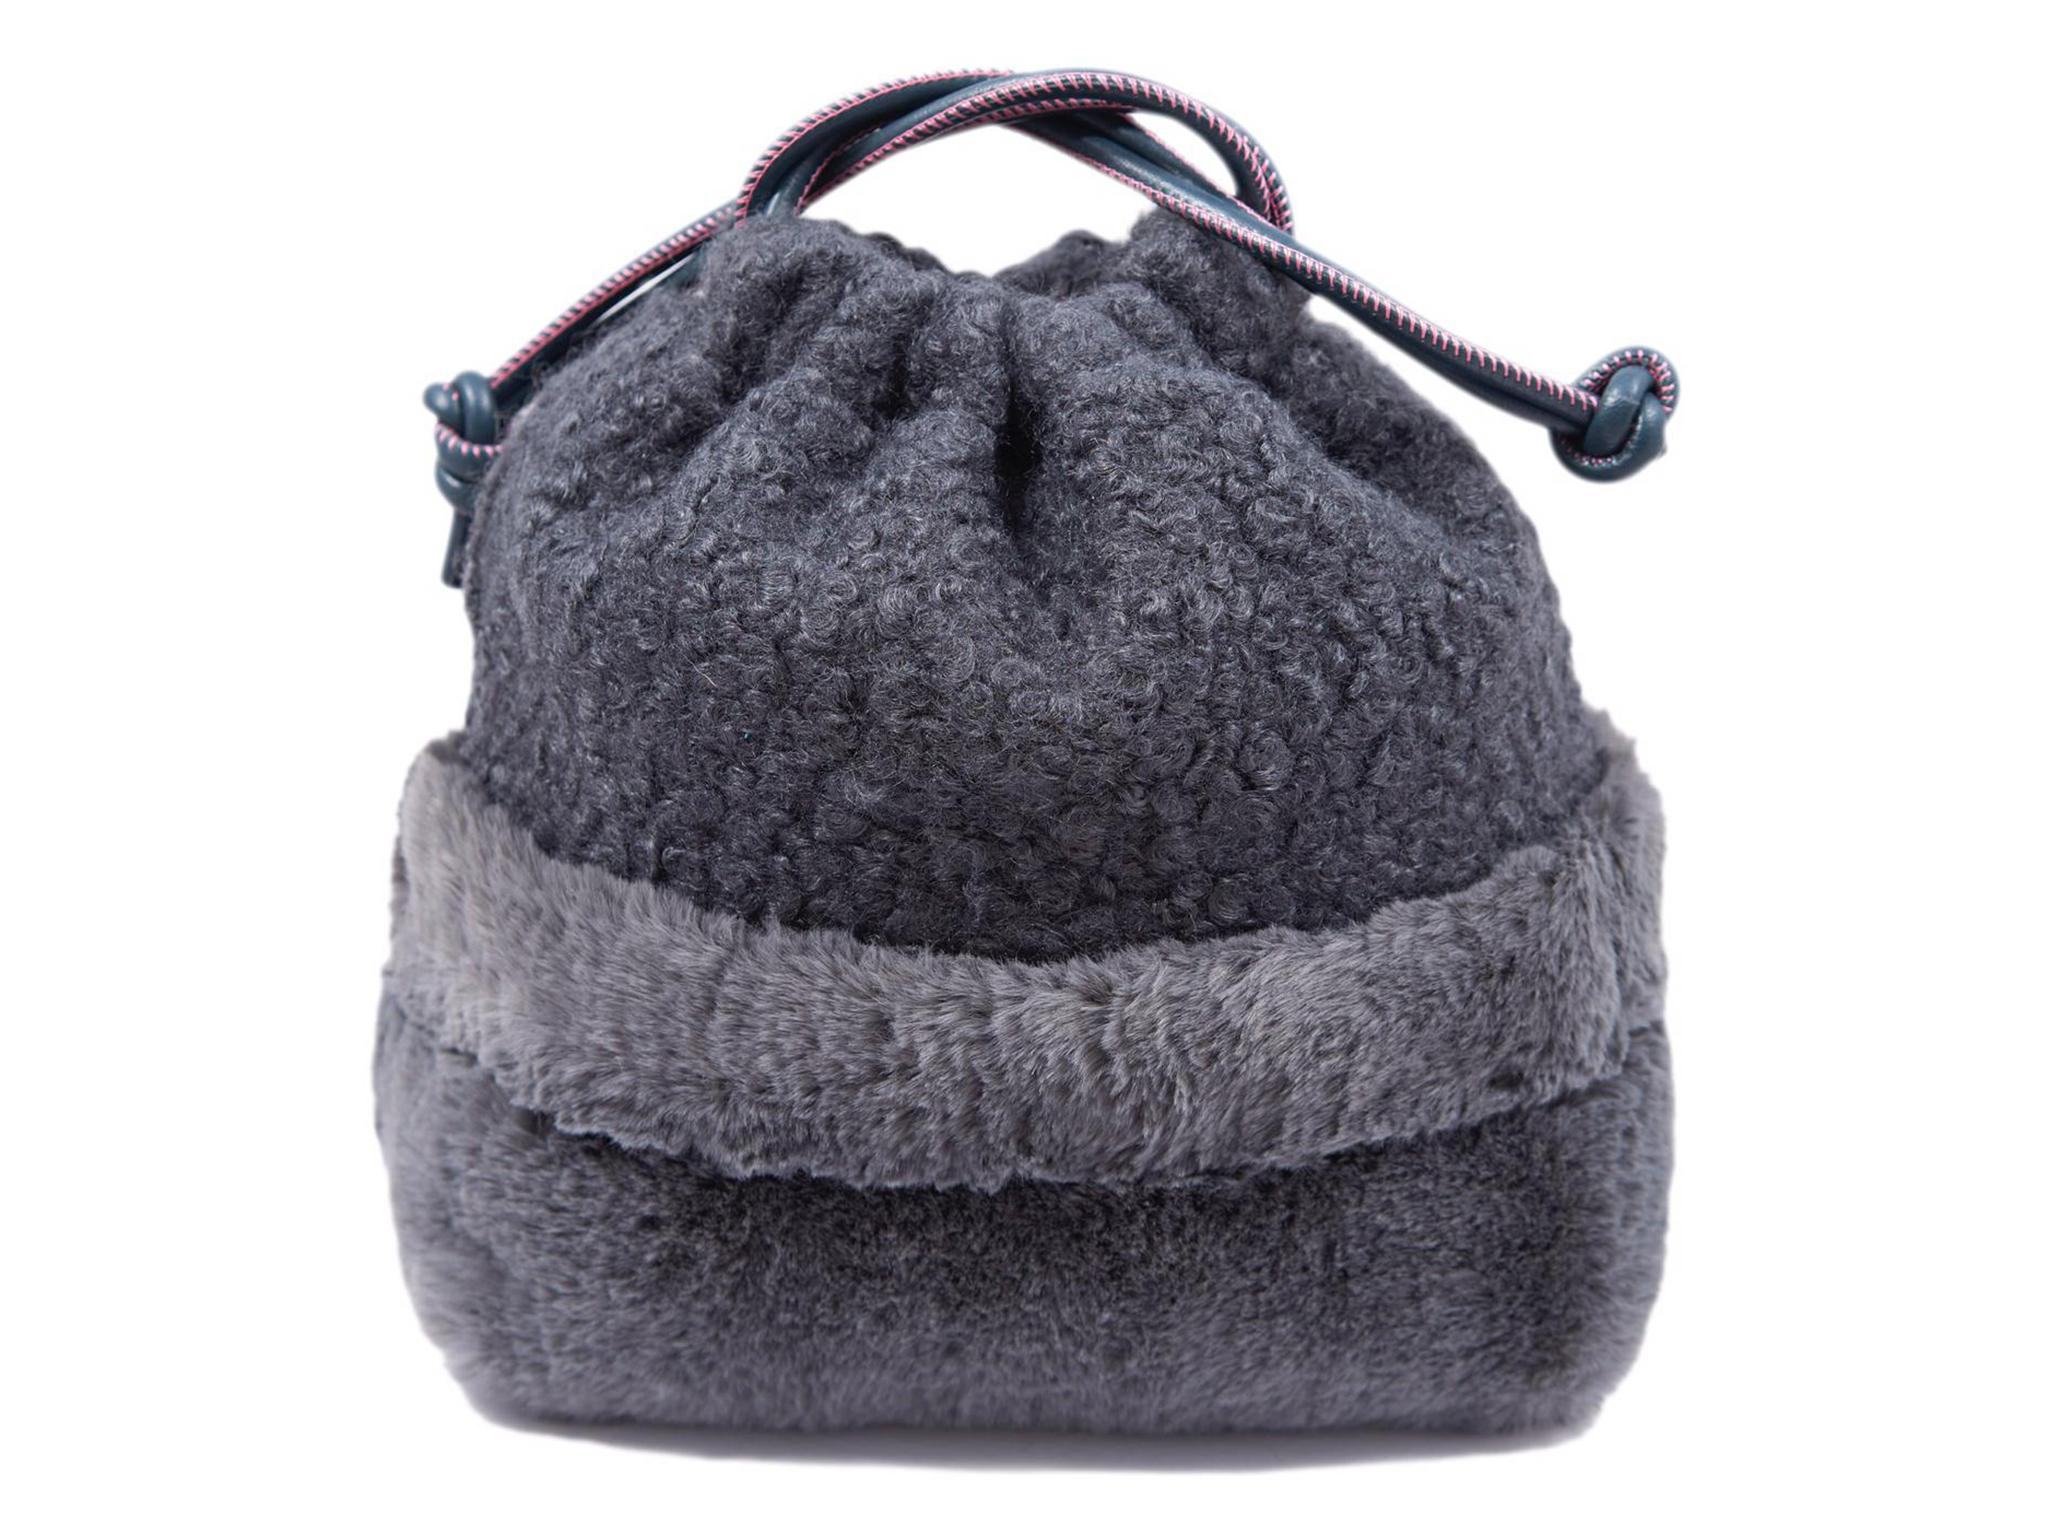 1d8173a66f1 Prettysac Charcoal Faux Fur and Wool Bag  £145, Prettysac